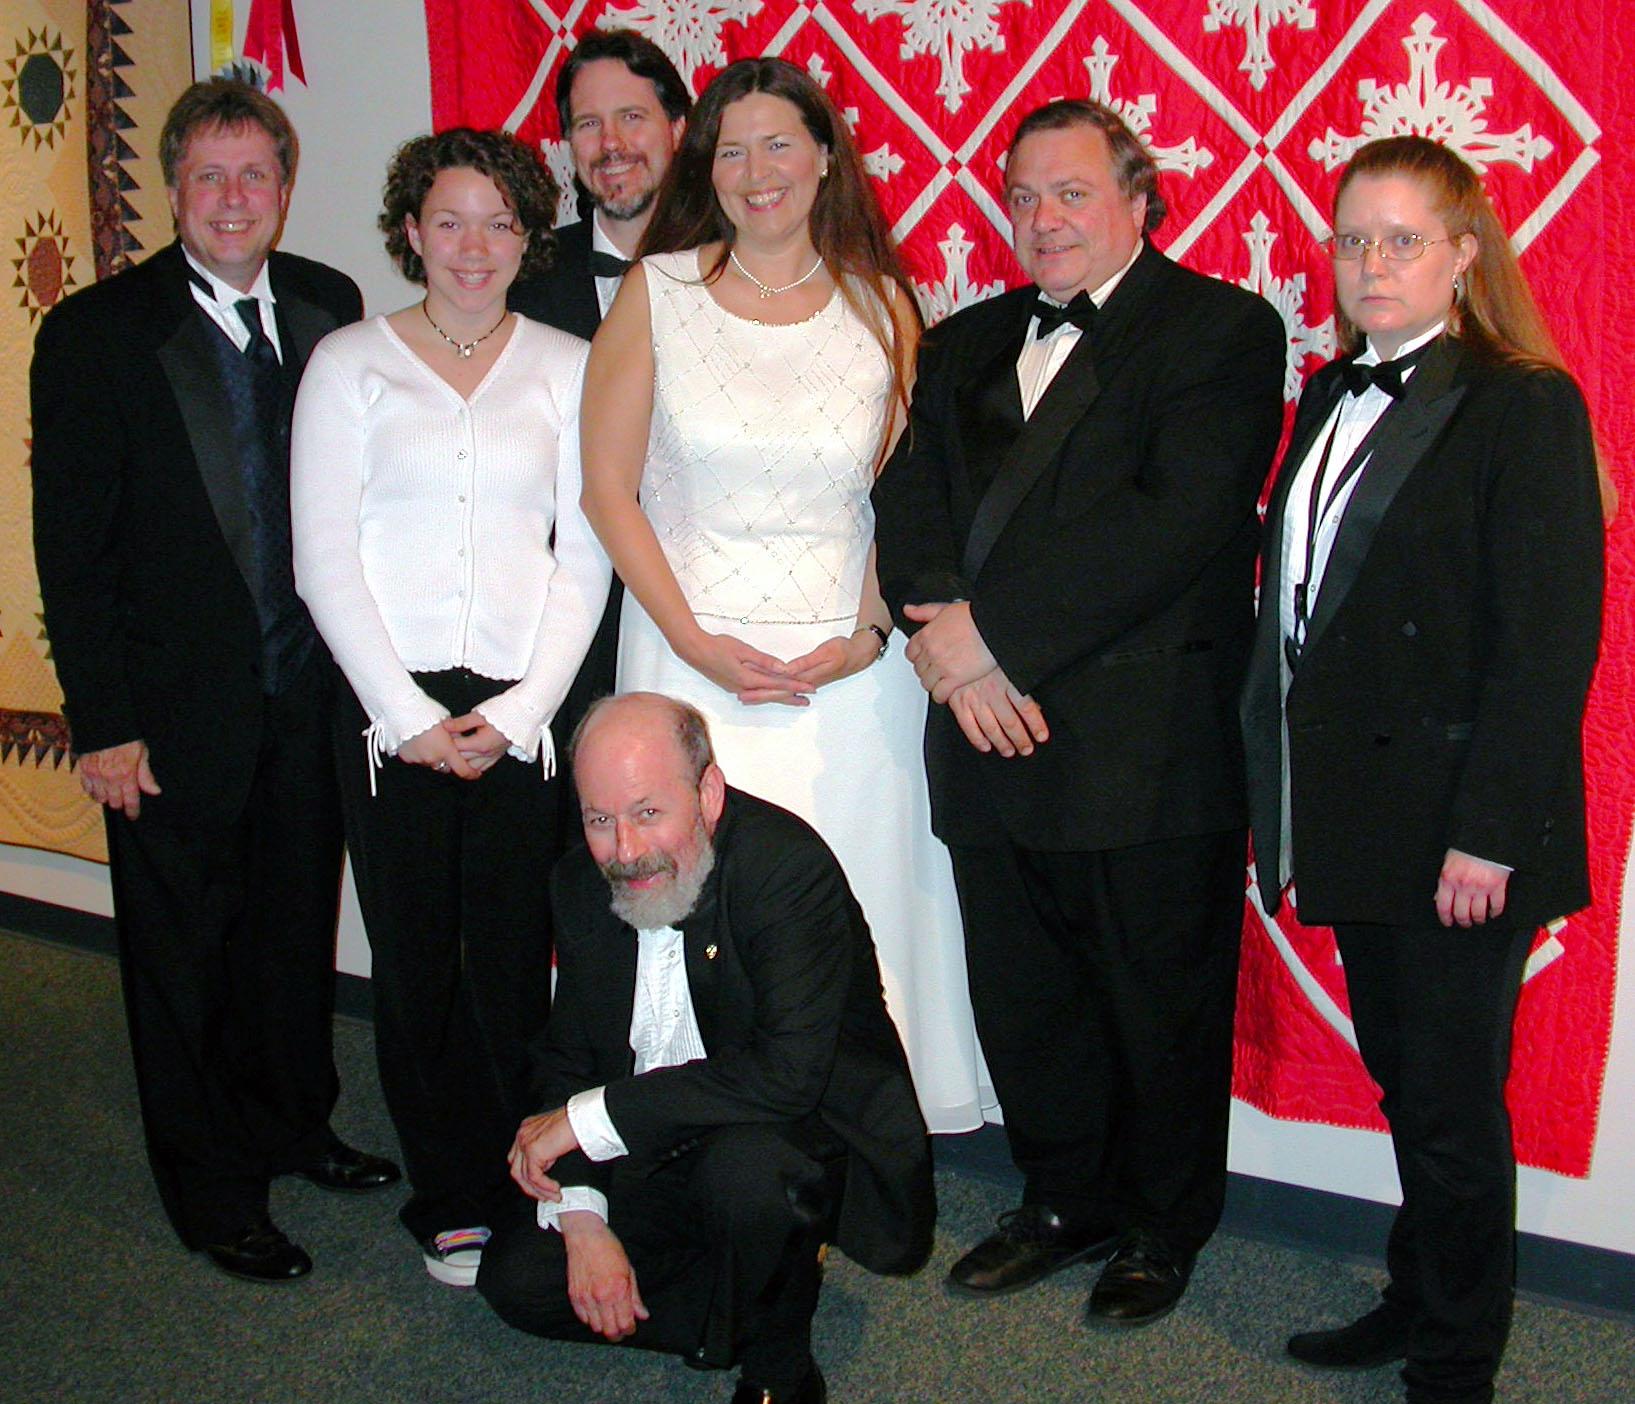 A Bill Sargent Custom Band - Bill Sargent, Kayla Luty, Brad Pregeant, Dan Shapera (Kneeling), Josie Treinen, Jeff Pietrangelo,